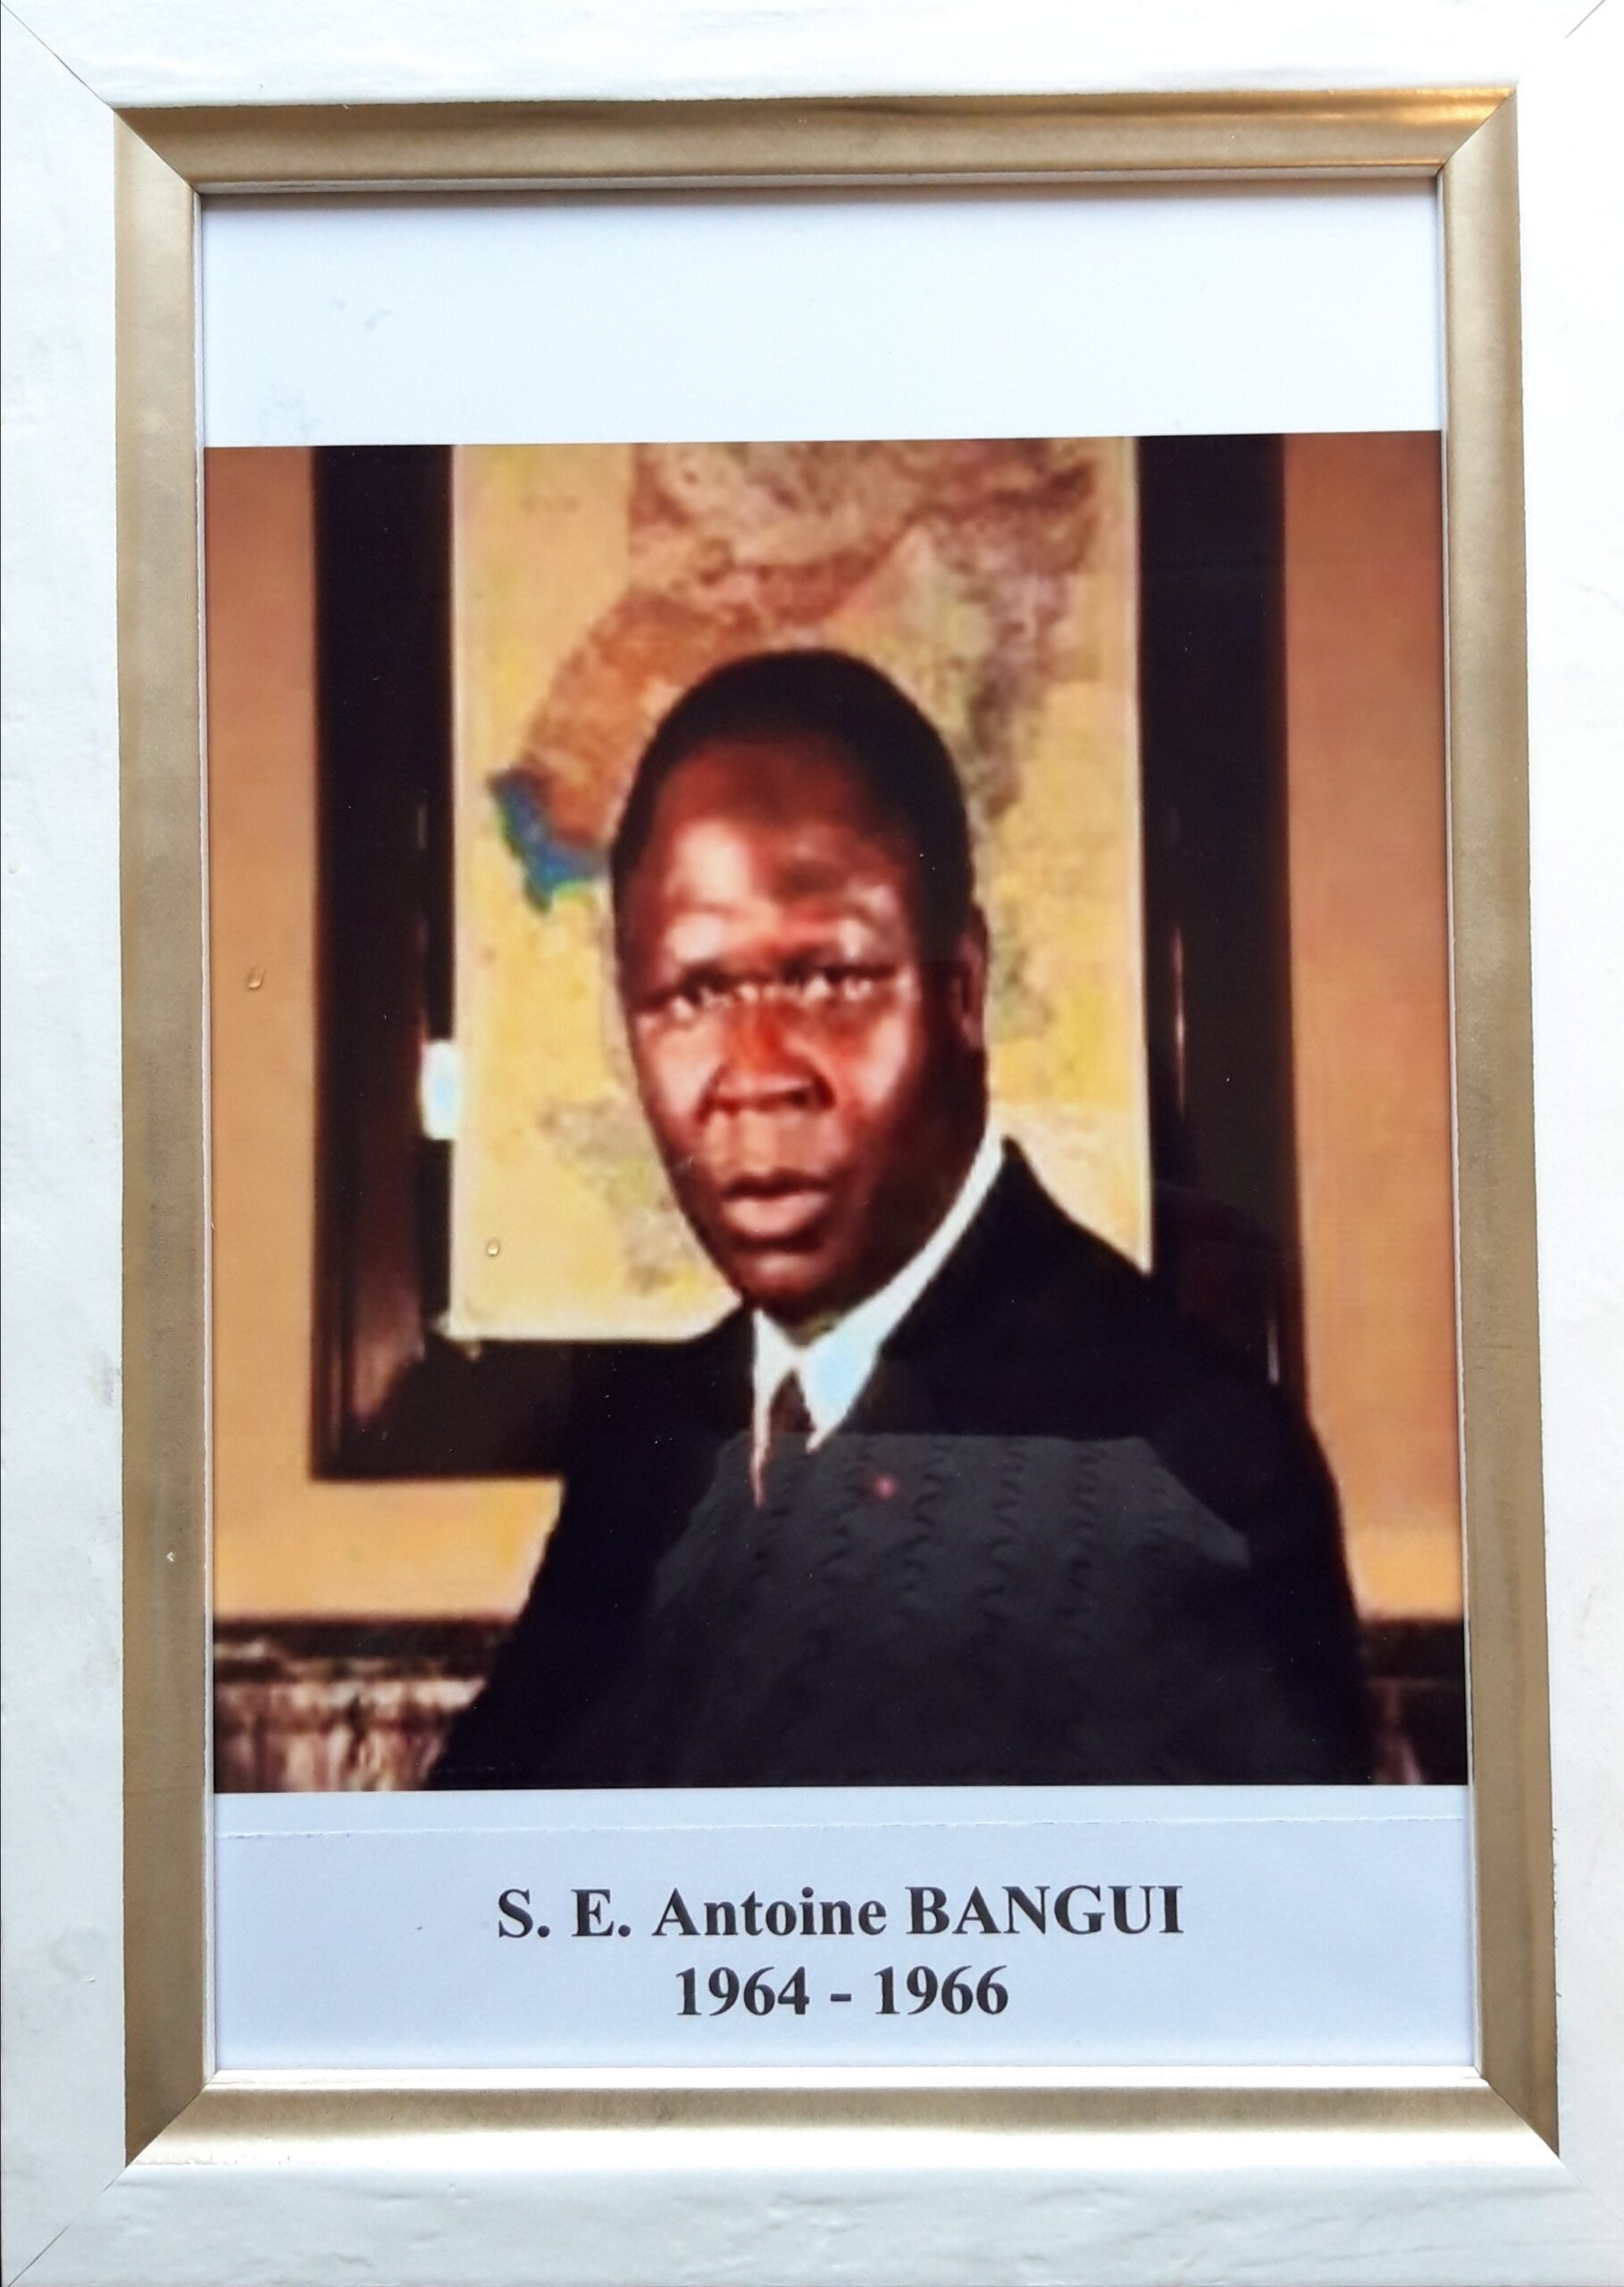 S.E. Antoine BANGUI